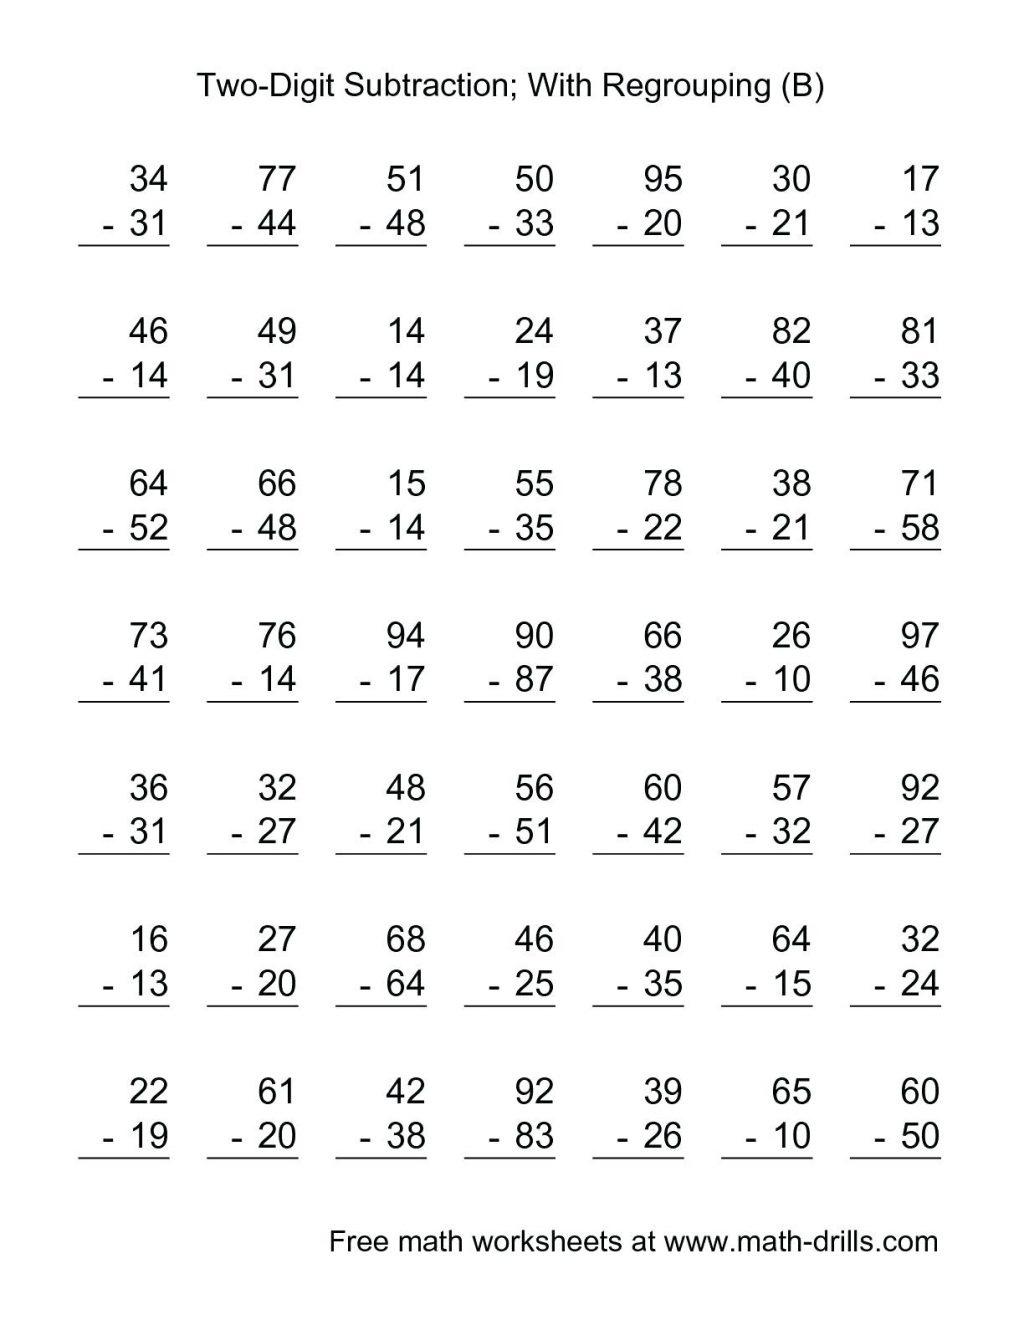 Worksheet: Faction Test Free Cursive Worksheets 5Th Grade Math - Free Printable Hindi Comprehension Worksheets For Grade 3